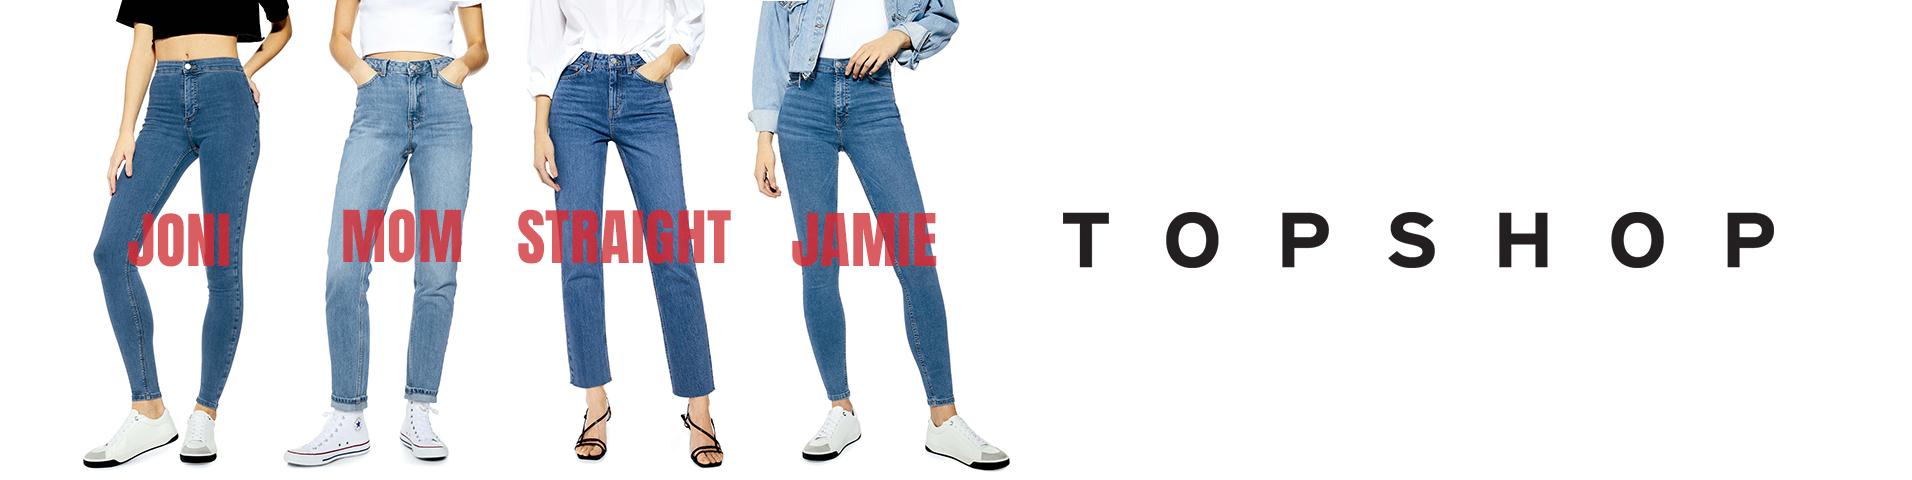 Topshop Damen Jeans | Entdecke deine perfekte Jeans online